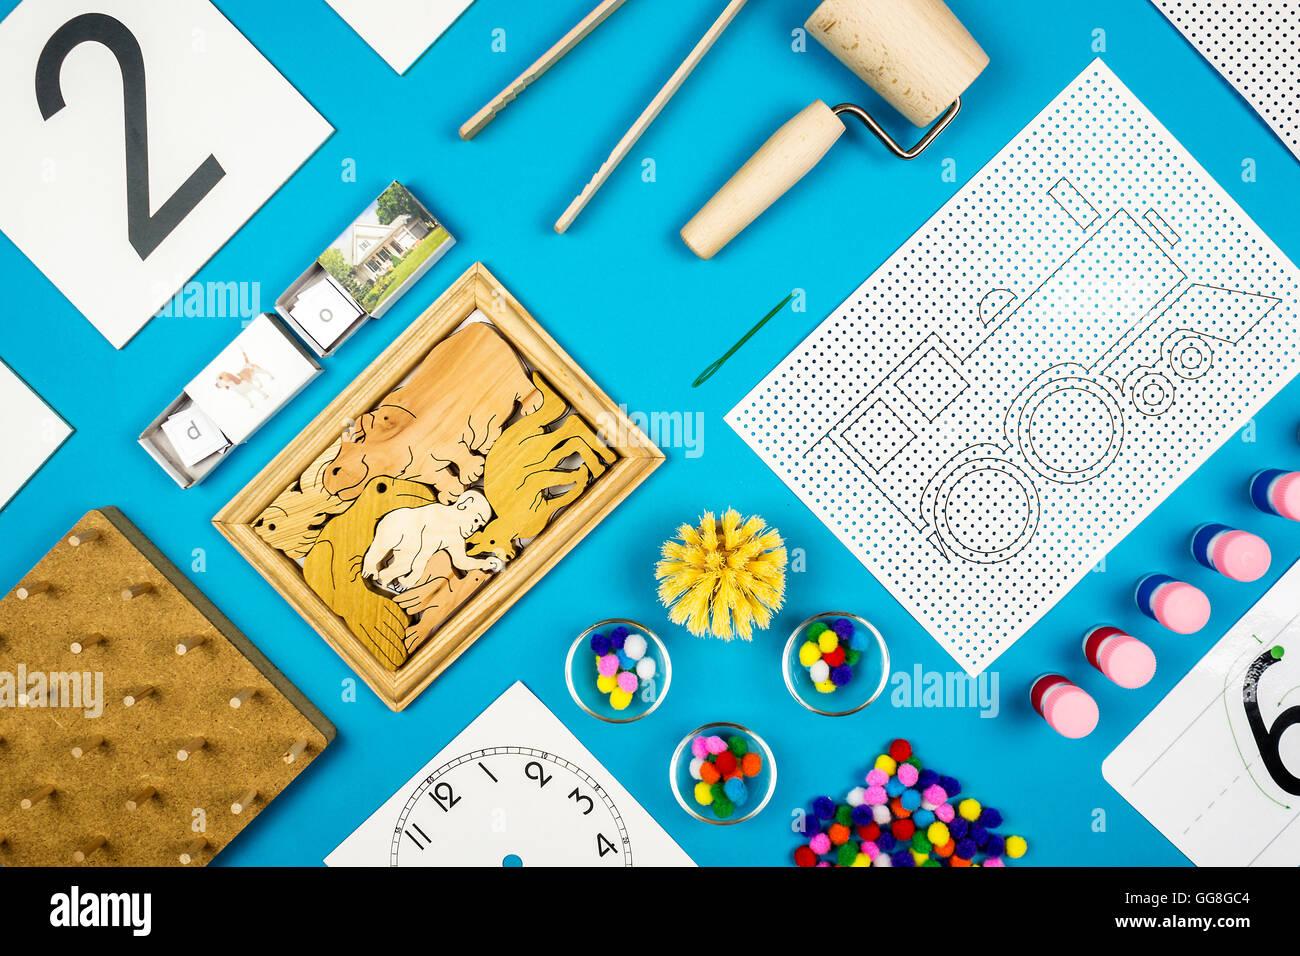 Montessori Stock Photos & Montessori Stock Images - Alamy